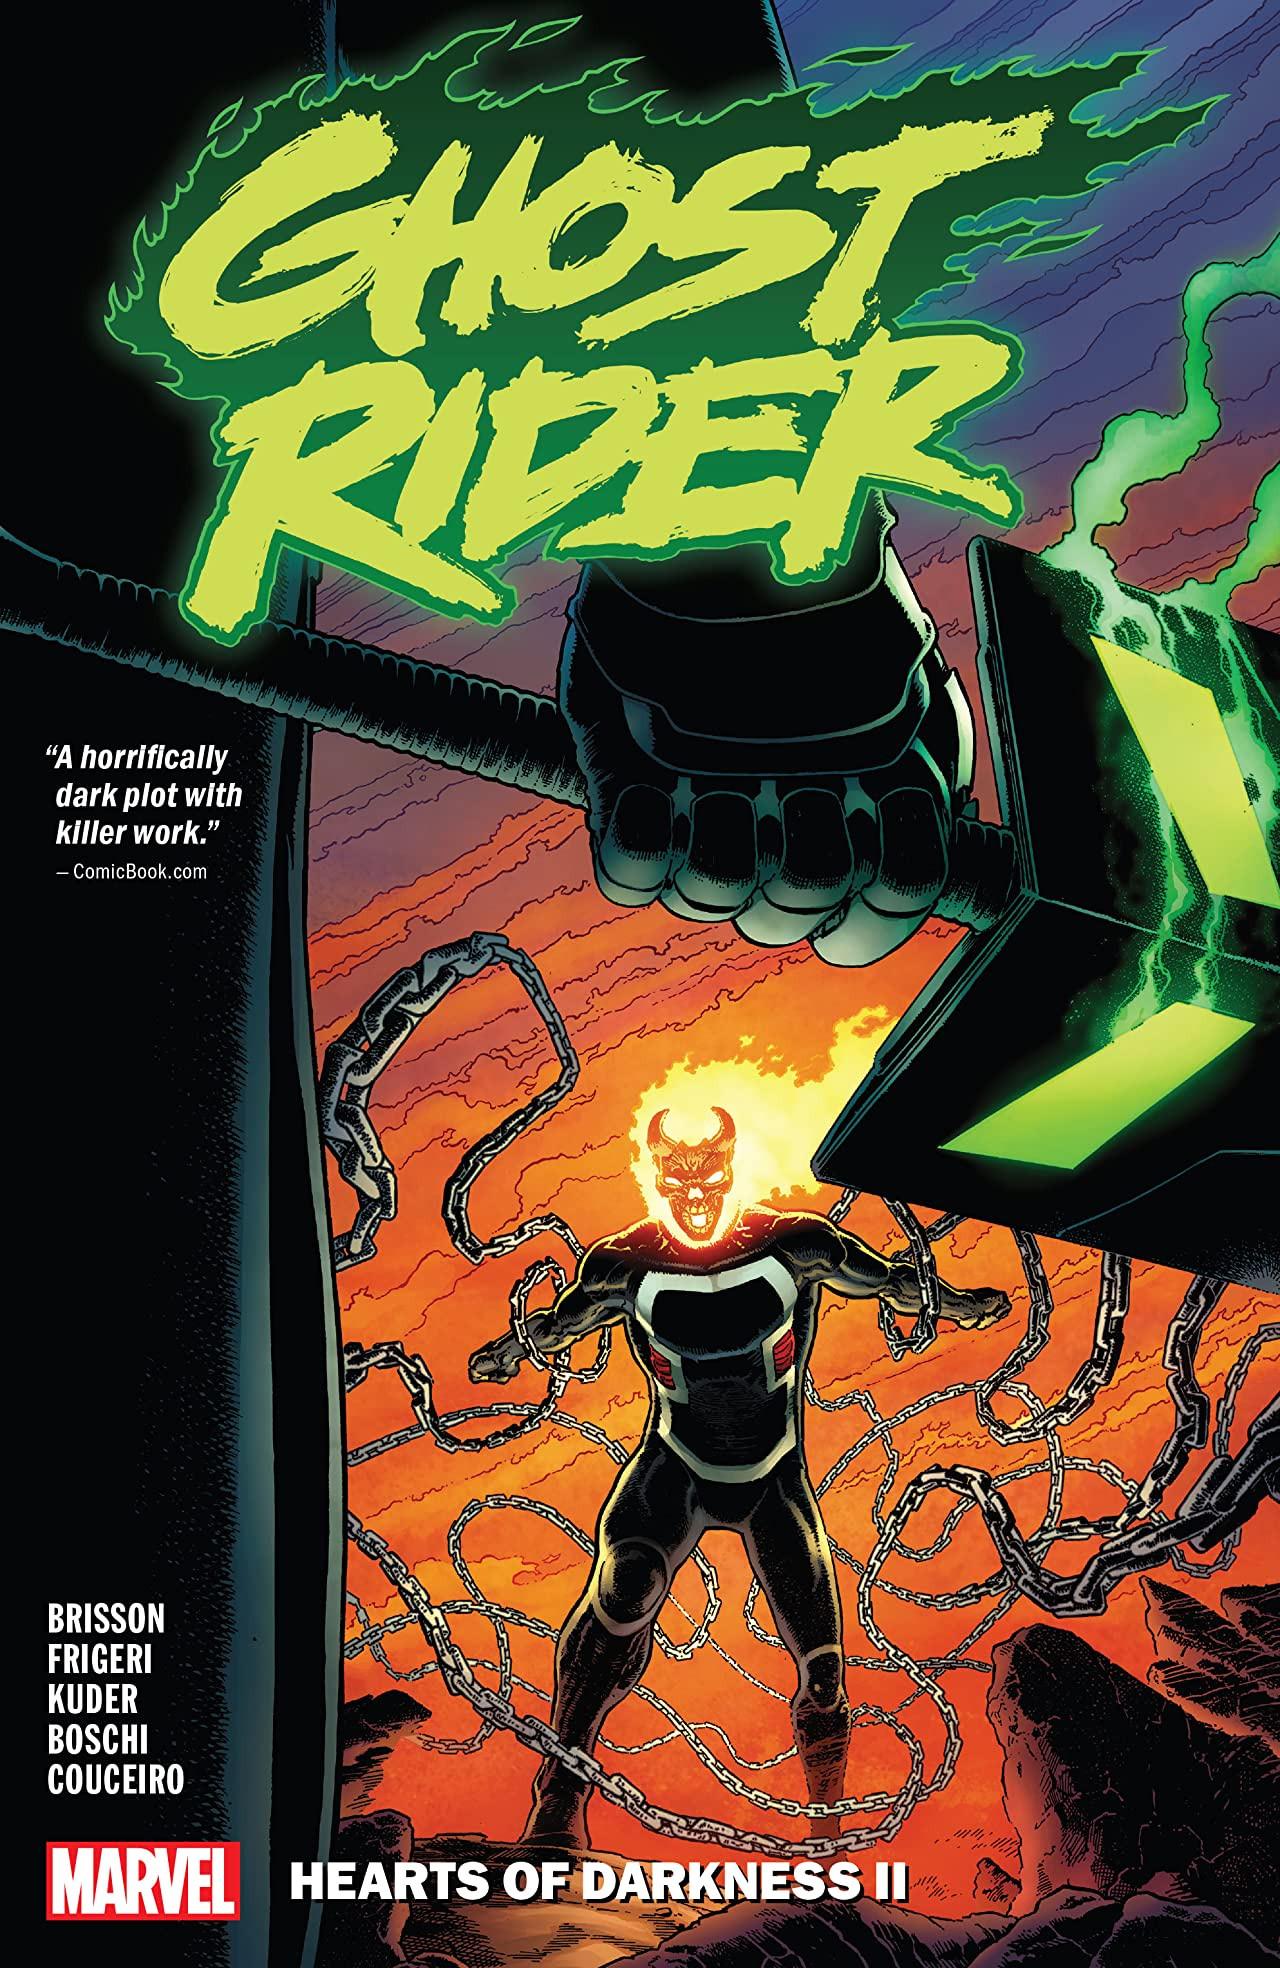 Ghost Rider TPB Vol 1 2: Hearts of Darkness II